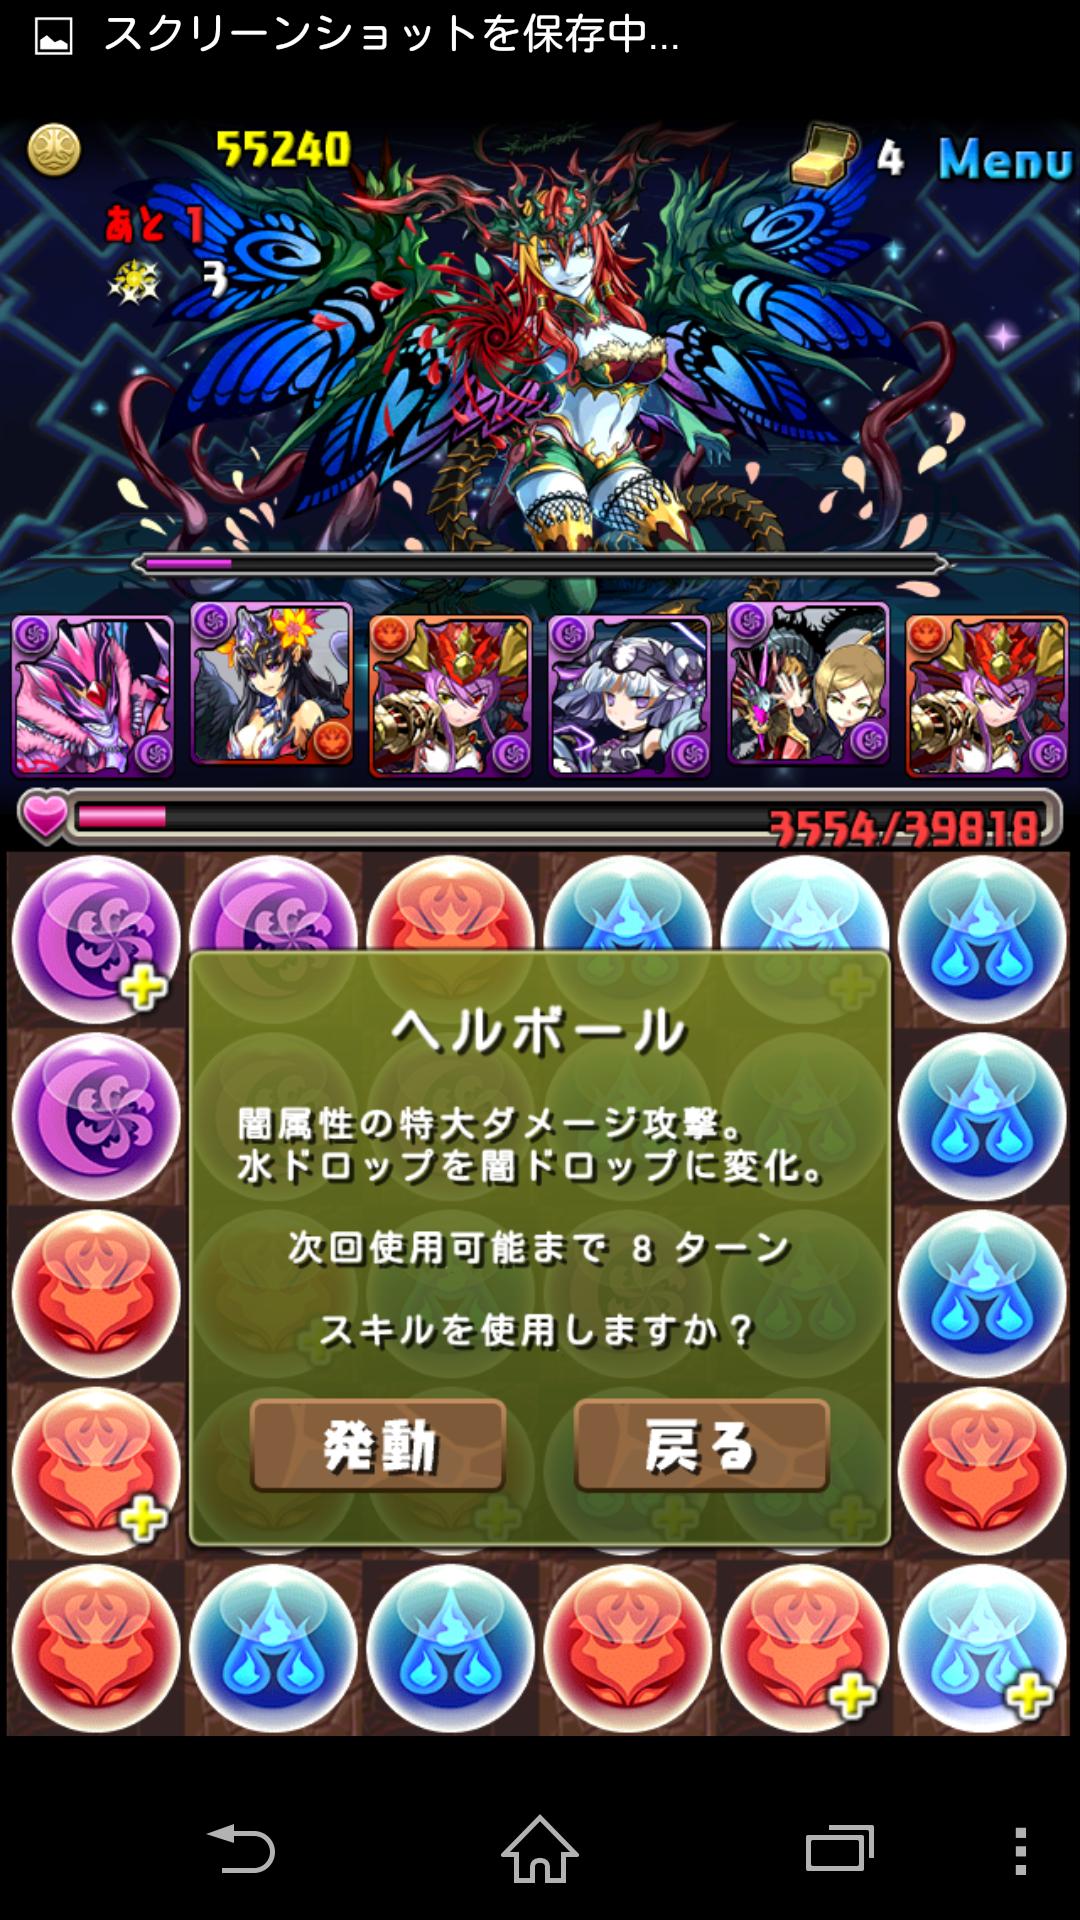 Screenshot_2014-12-19-01-29-53.png